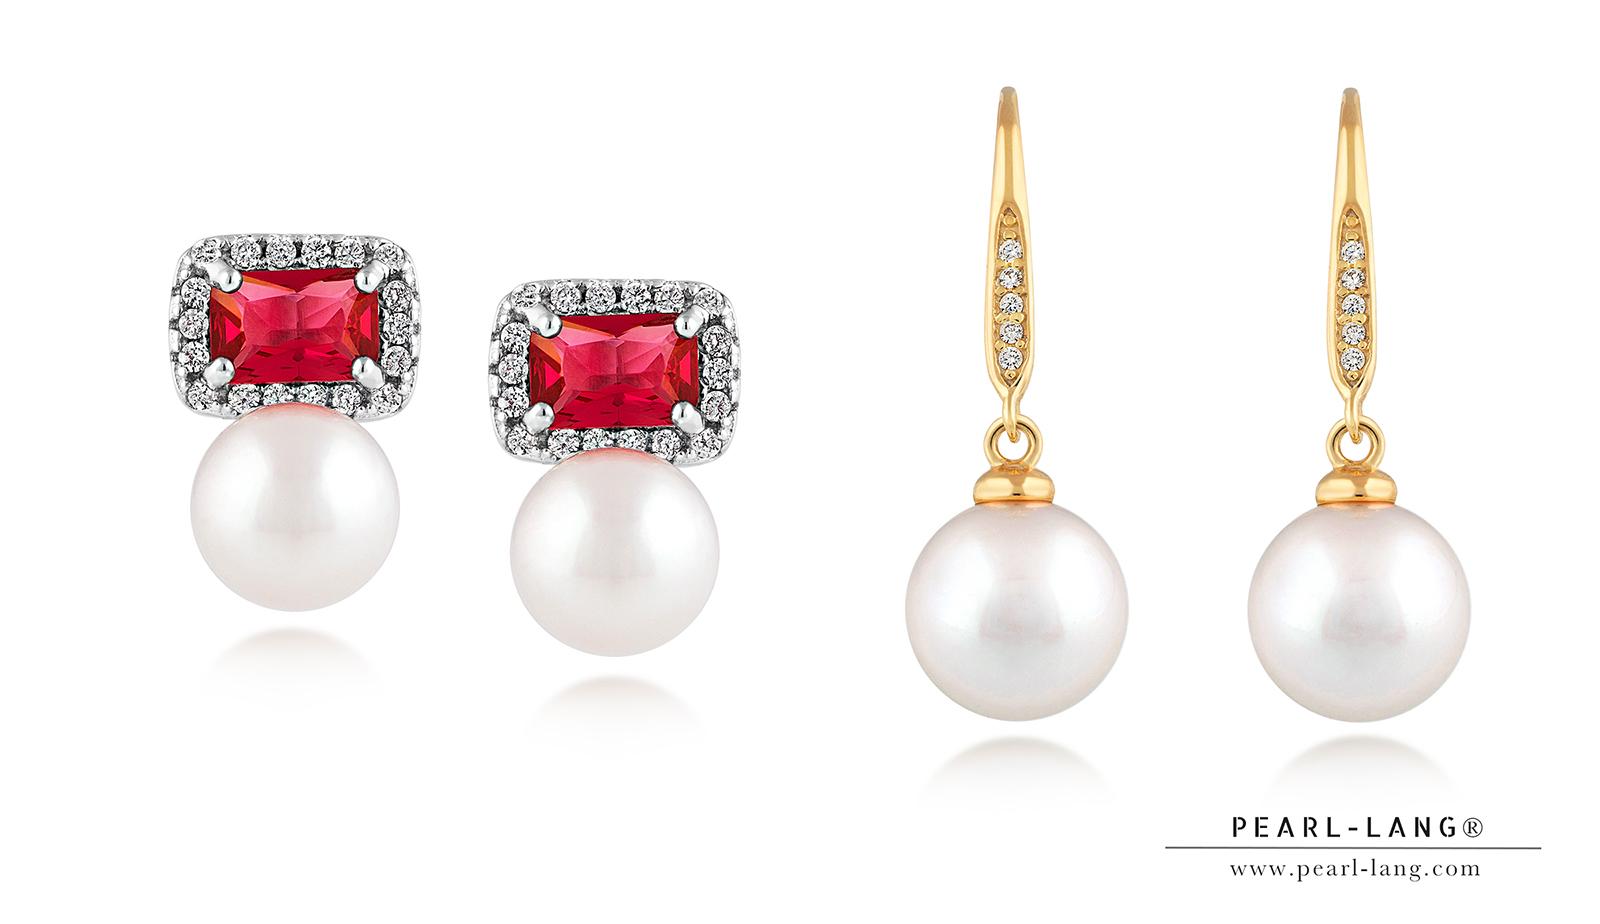 Pearl - Lang Jewellery